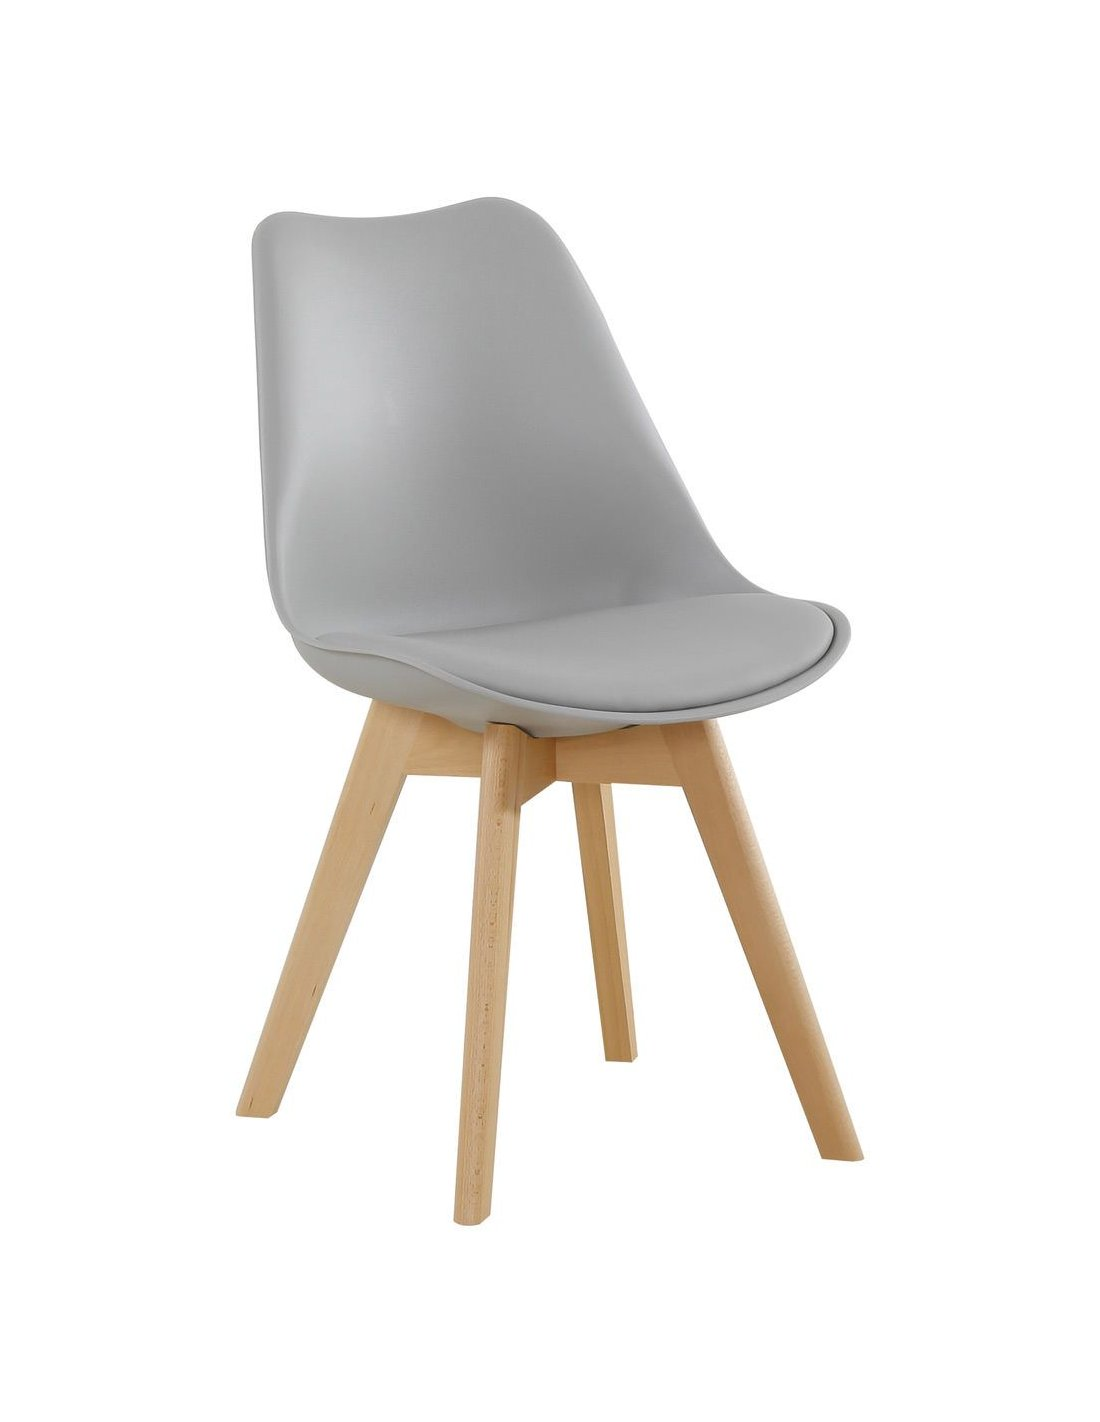 Meubles Kayoom Design Chaise 2er Set Chaise de Cuisine ...